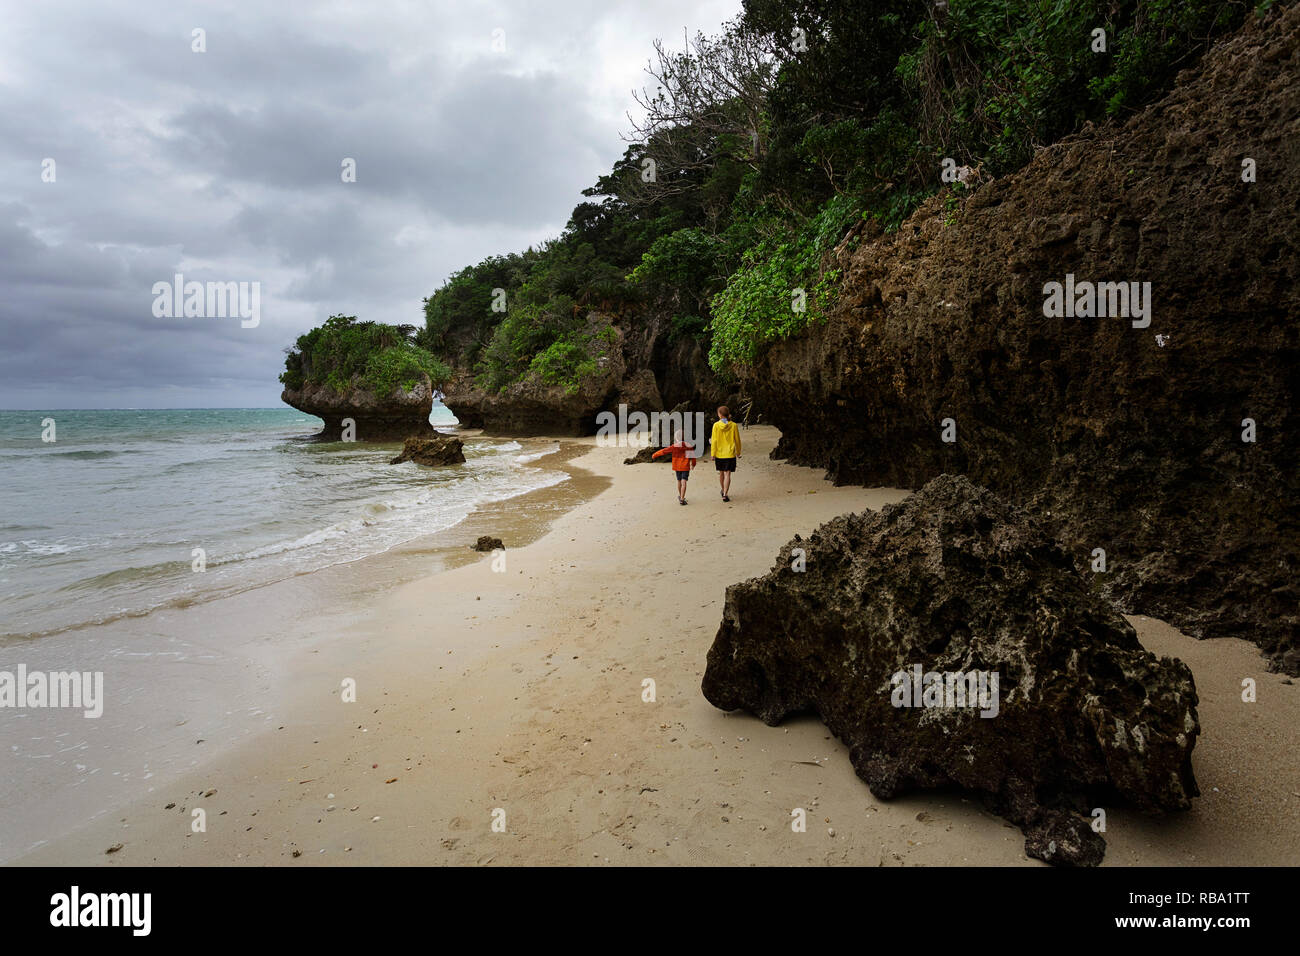 Mother and son walking on dramatic sandy beach with limestone scultures at Ibaruma Sabichi Cave, Ishigaki, Japan Stock Photo